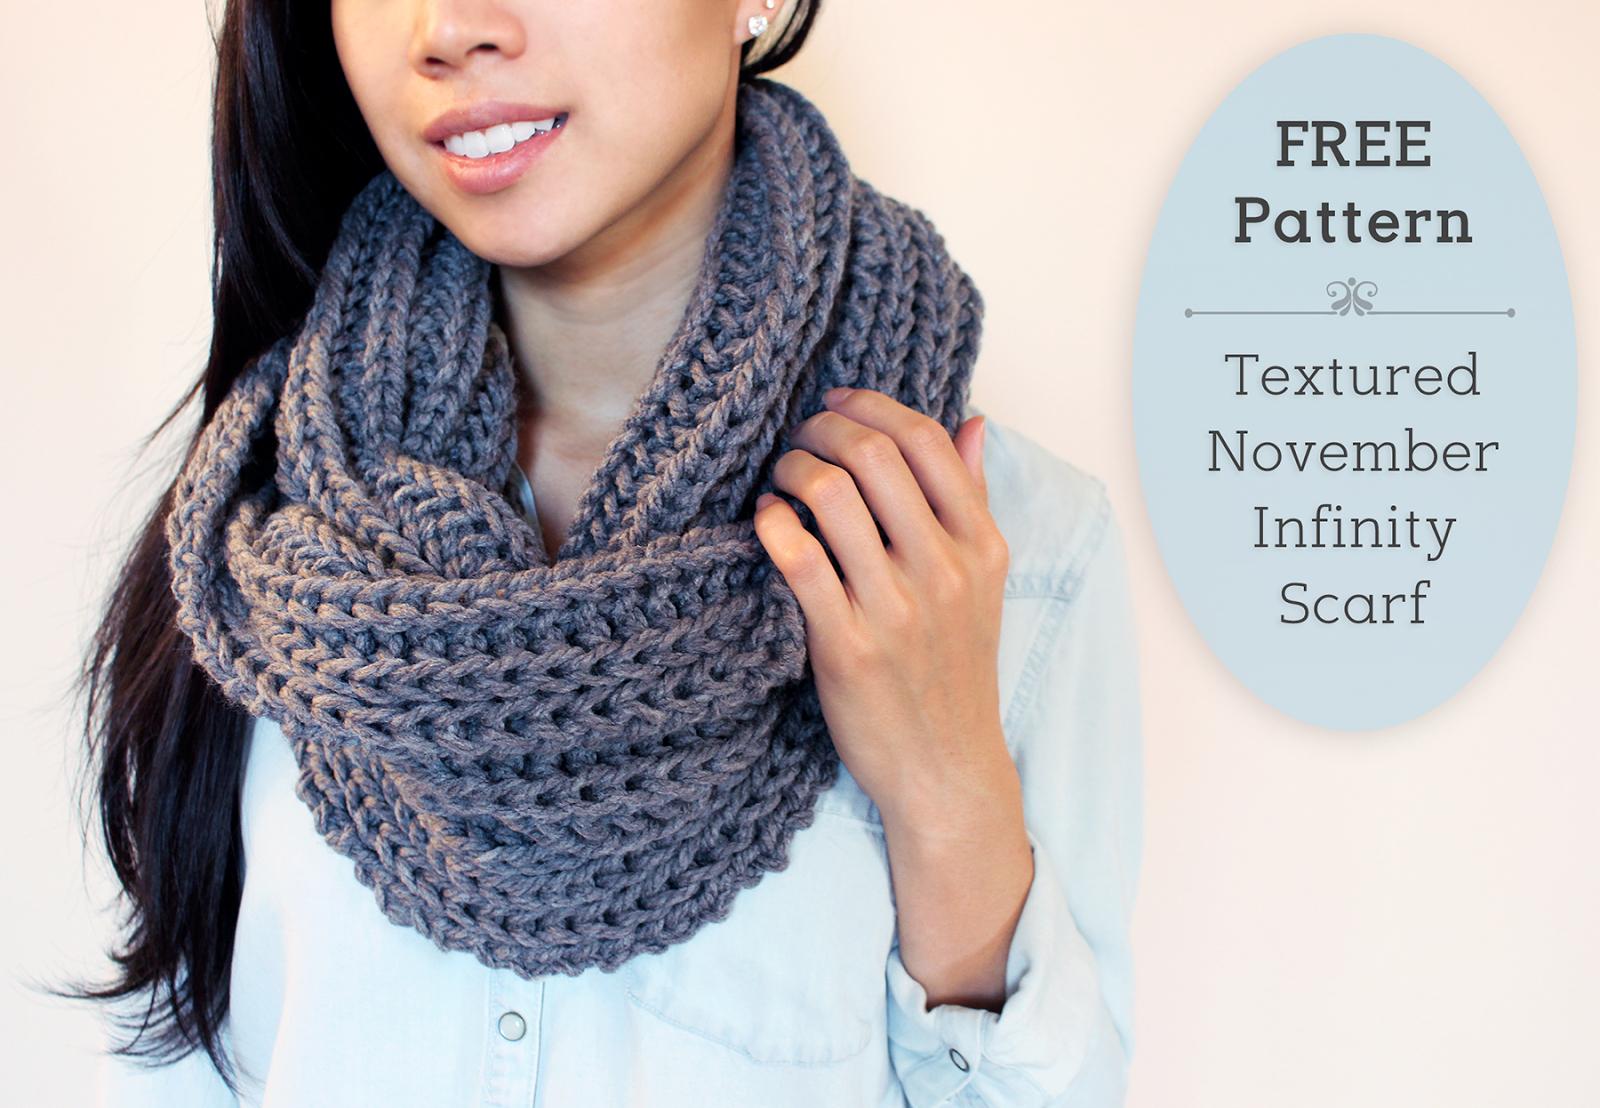 Chunky Knit Infinity Scarf Pattern Purllin Textured November Infinity Scarf Free Pattern